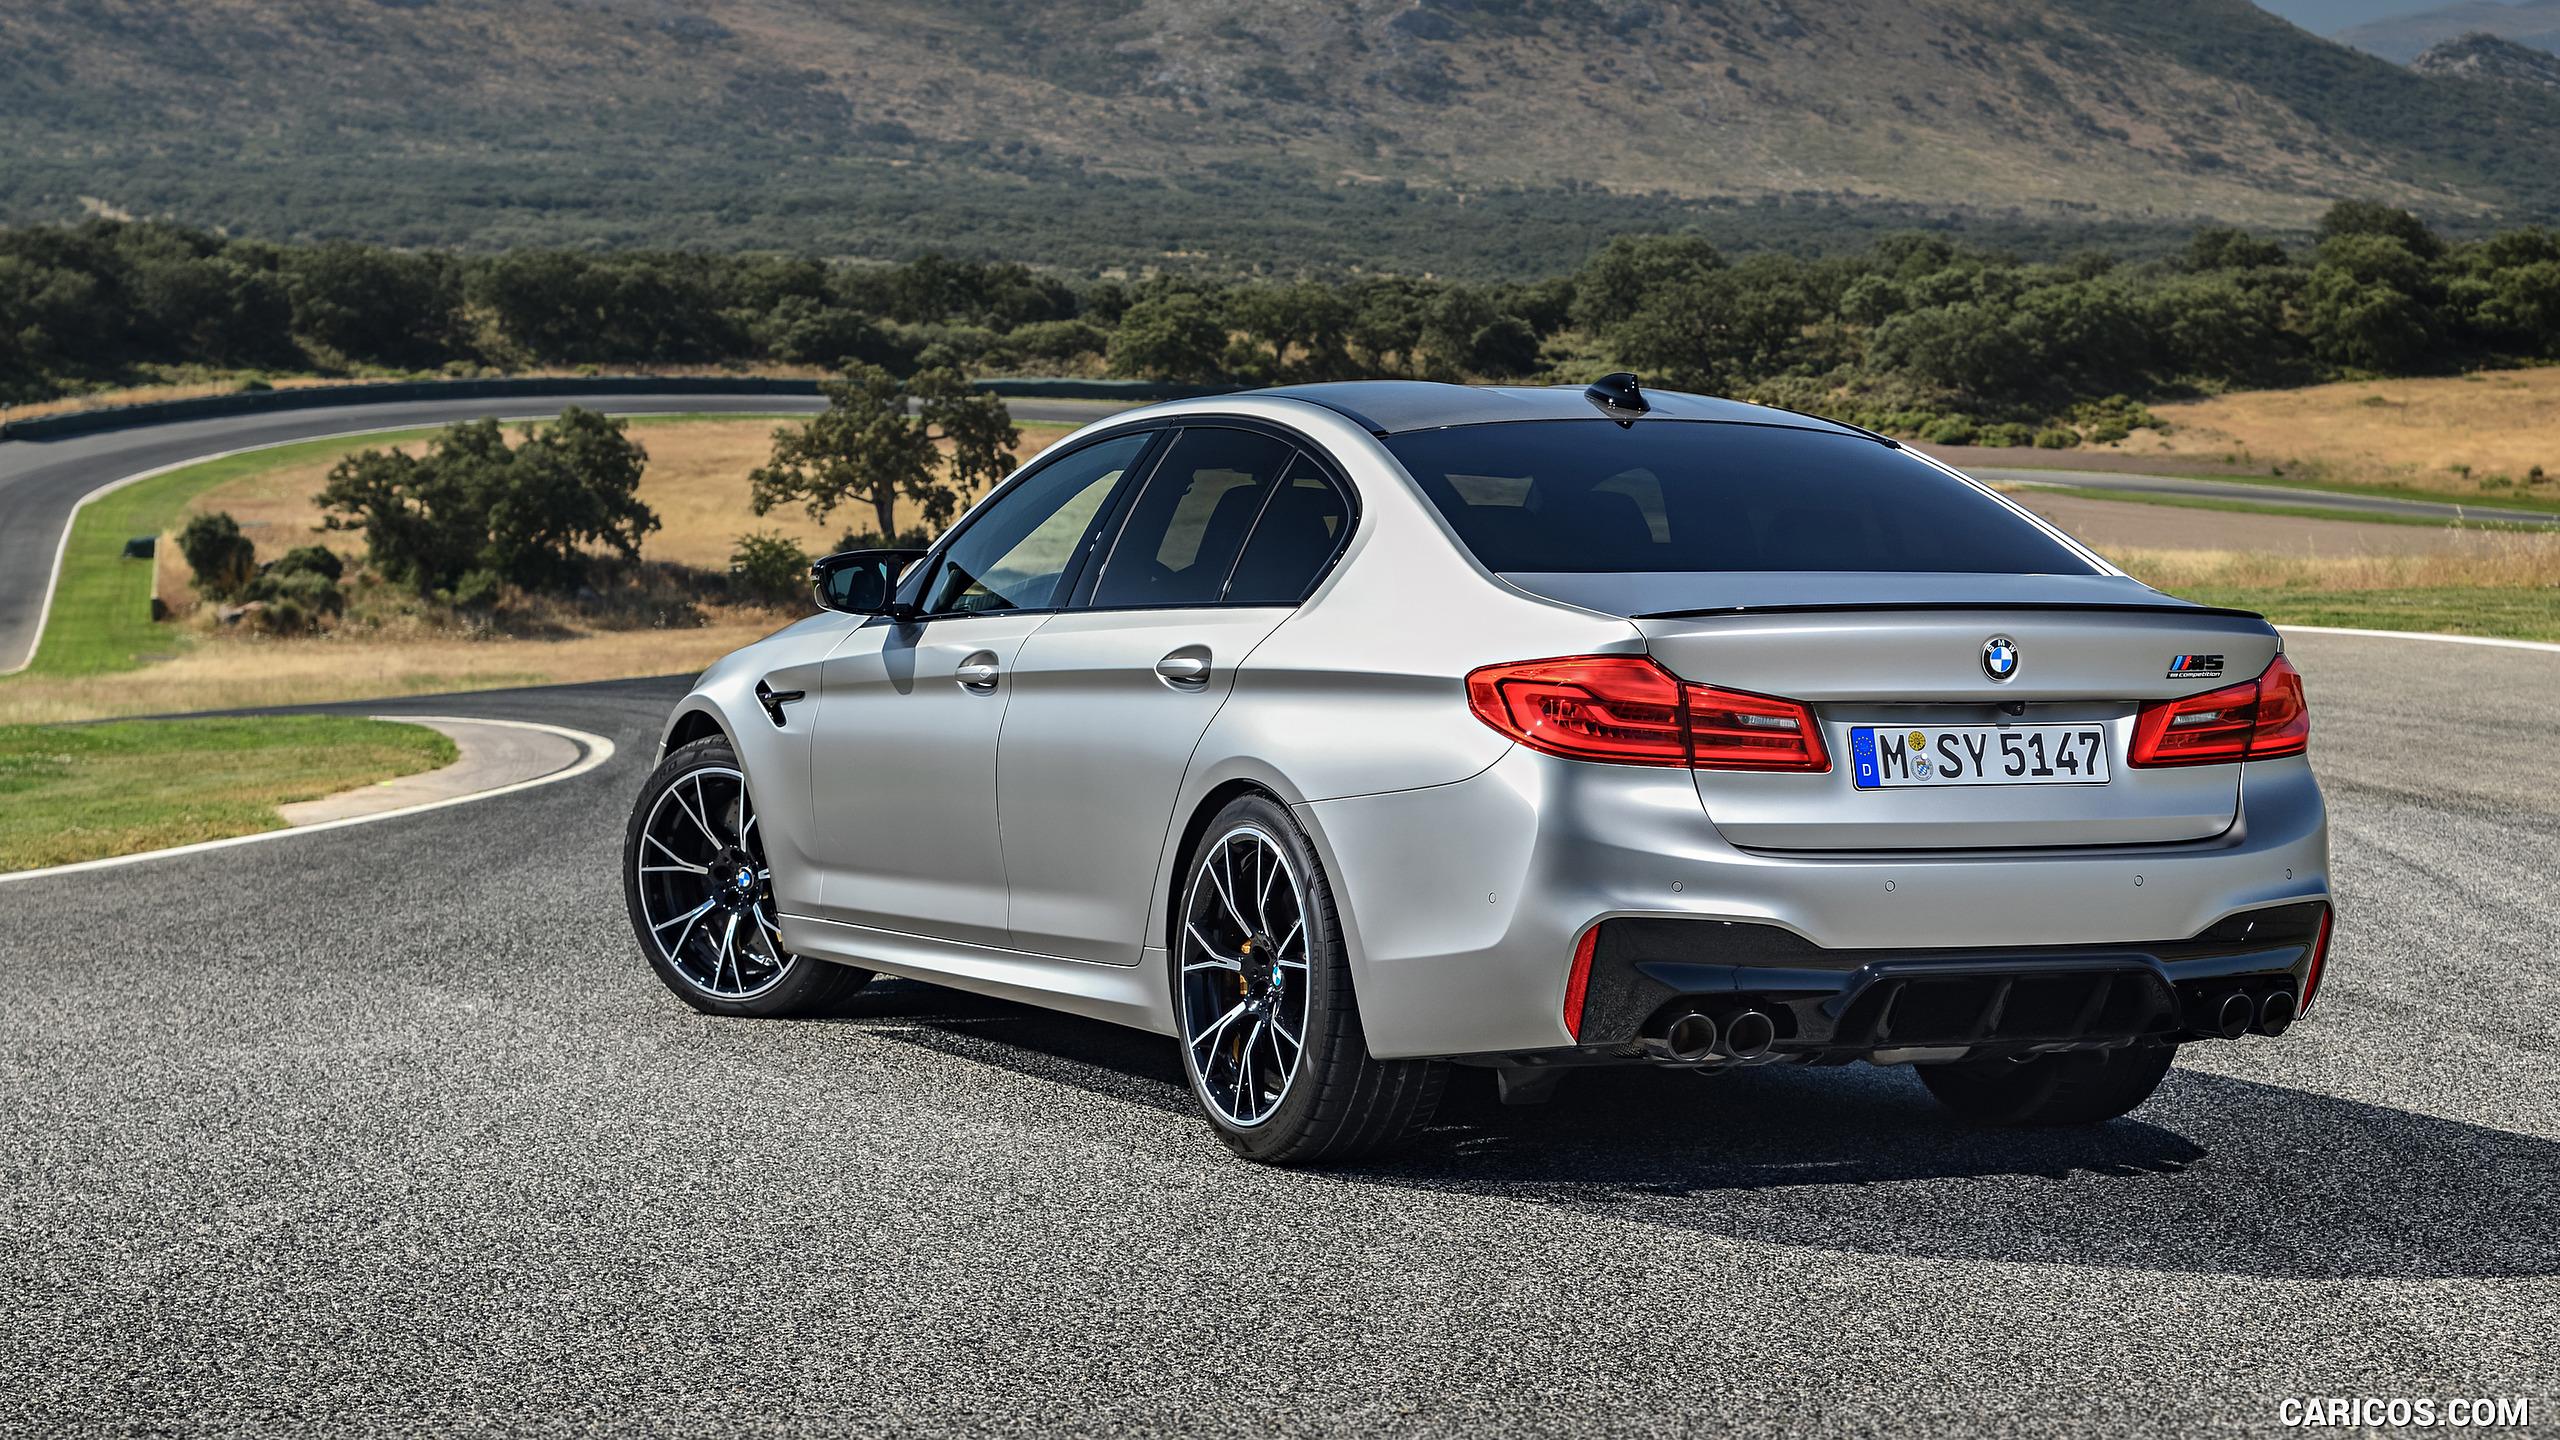 2019 BMW M5 Competition   Rear Three Quarter HD Wallpaper 110 2560x1440